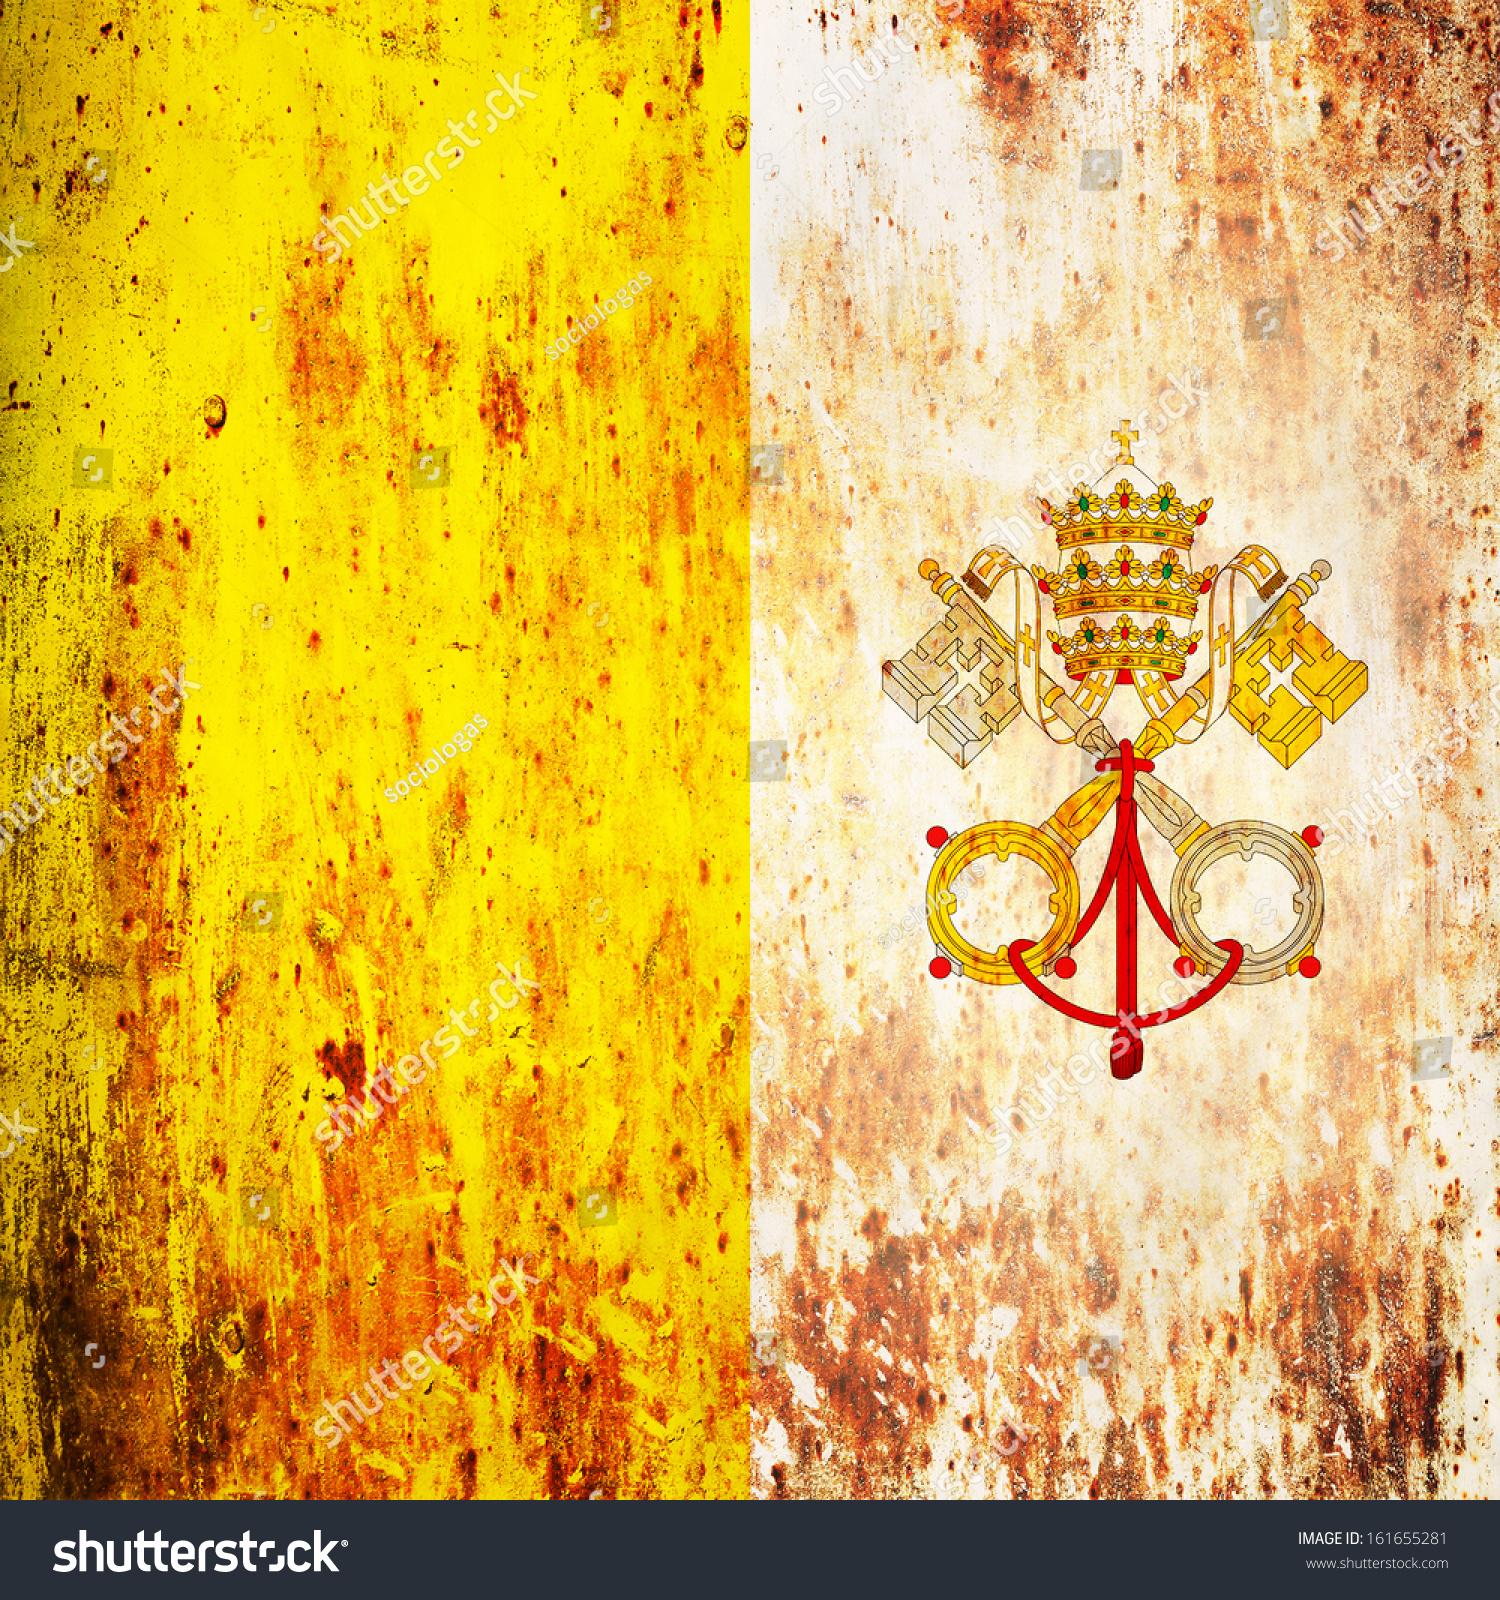 Grunge Flag Vatican Stock Photo 161655281 - Shutterstock